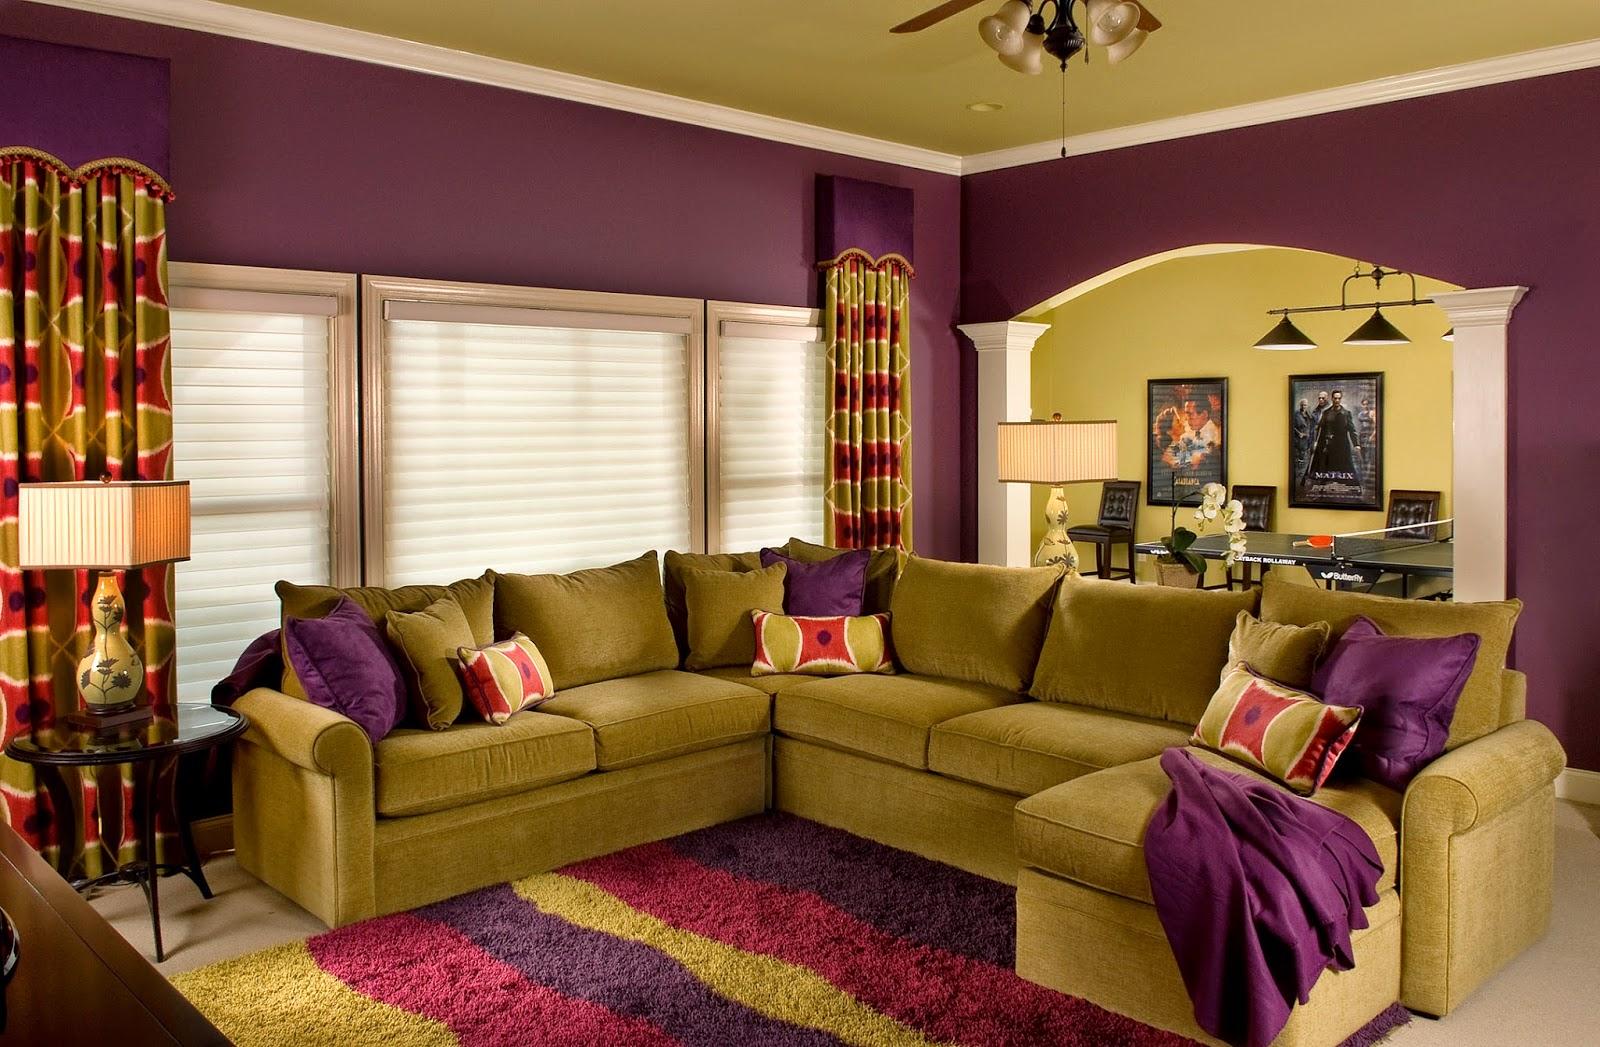 Hiasan Dalaman Ruang Tamu Warna Ungu Desainrumahid com